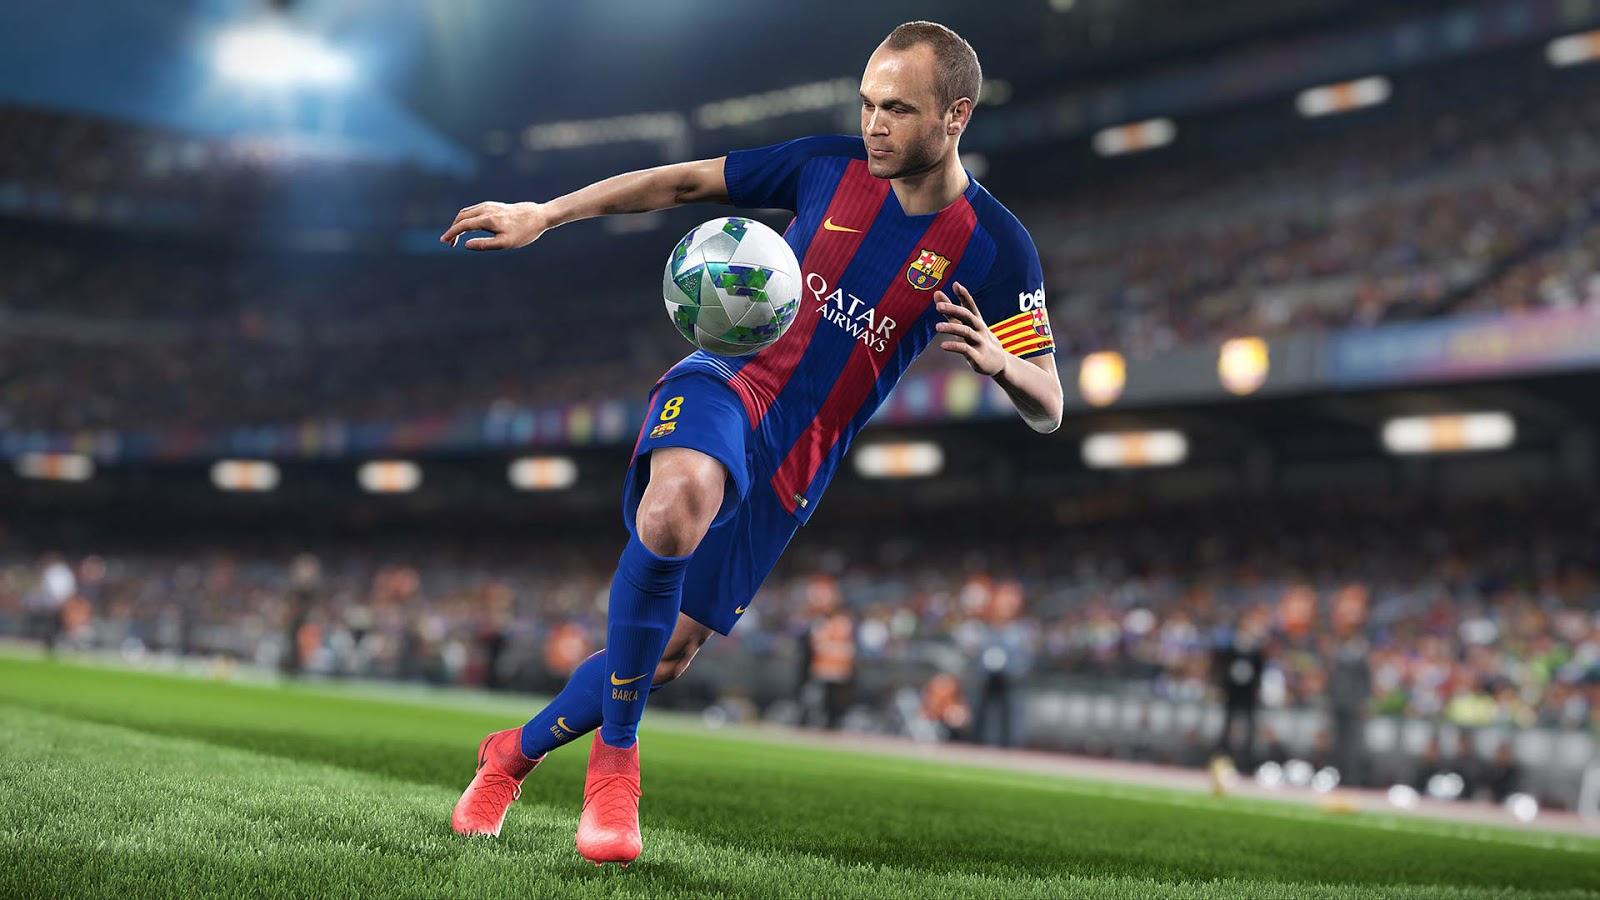 Pro Evolution Soccer 2018 Español [Juego PC] Full Crack